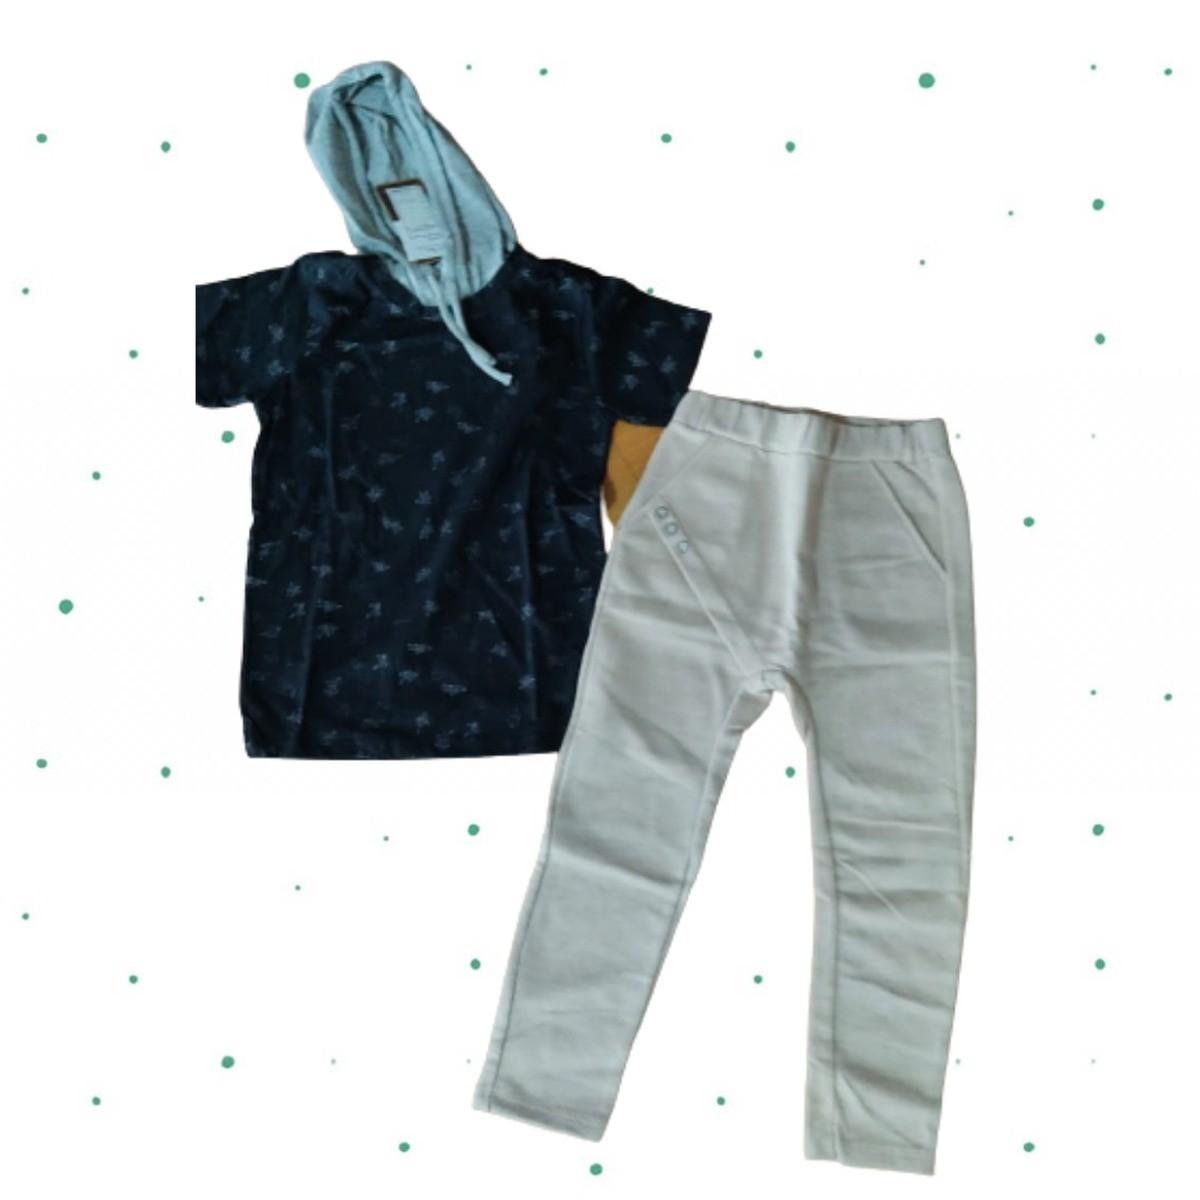 Conjunto Menino Up Baby Camiseta Algodão Bermuda Moletom